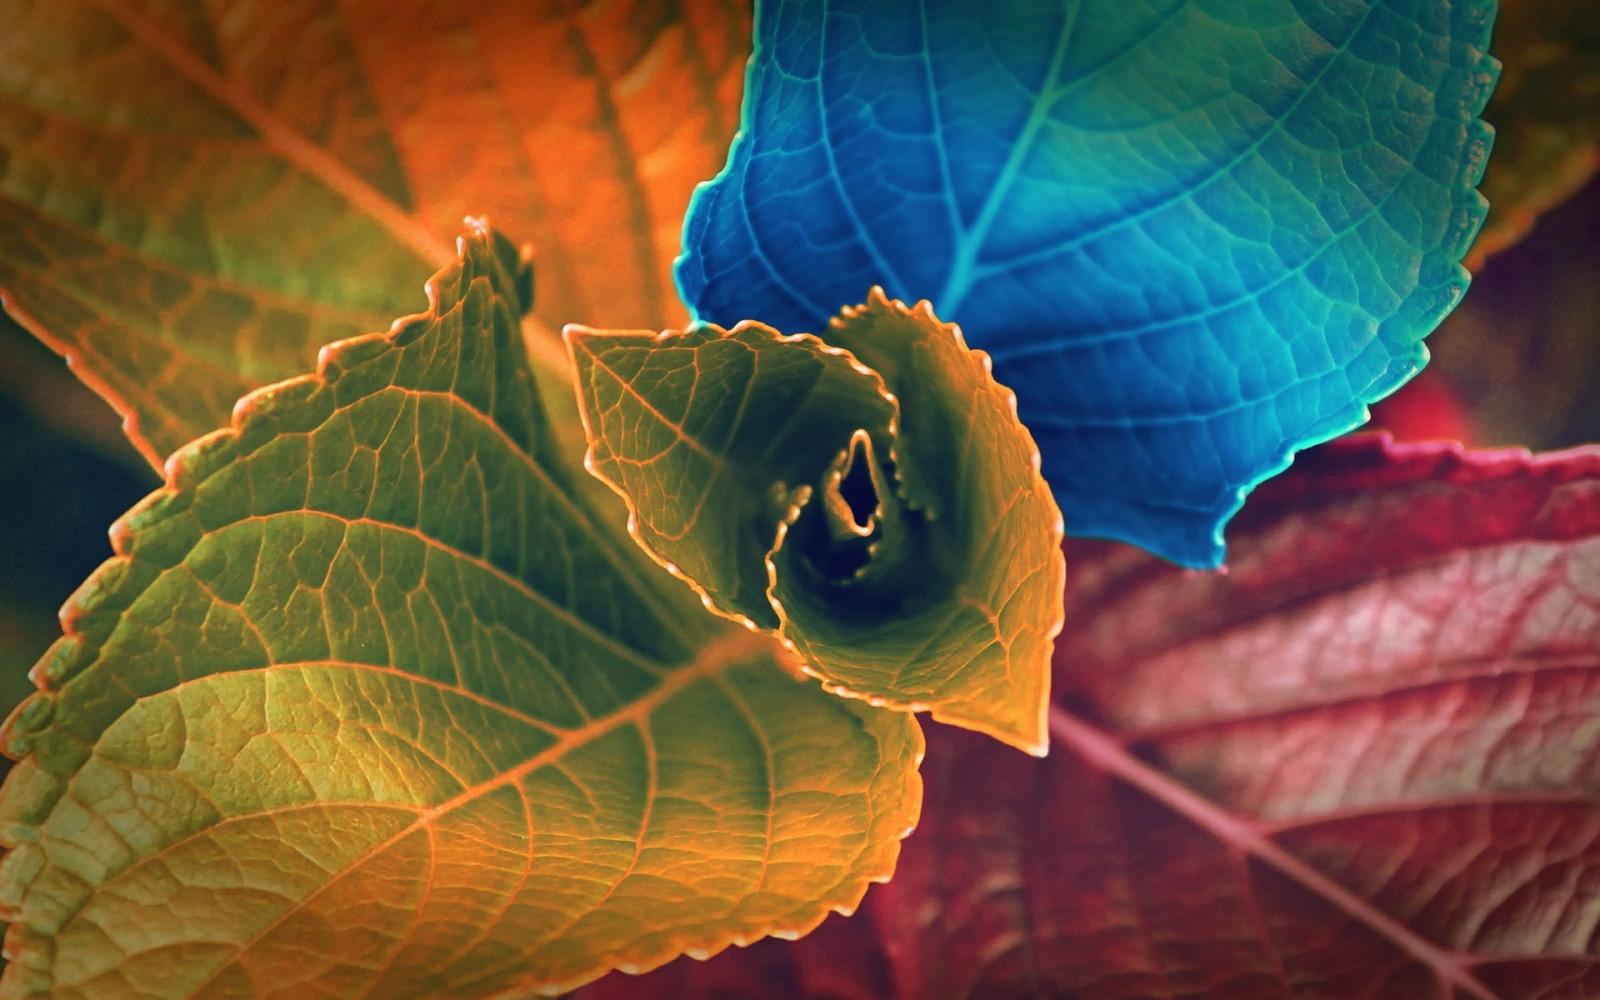 hintergrundbilder sonnenlicht bunt bl tter natur pflanzen fotografie makro insekt gr n. Black Bedroom Furniture Sets. Home Design Ideas